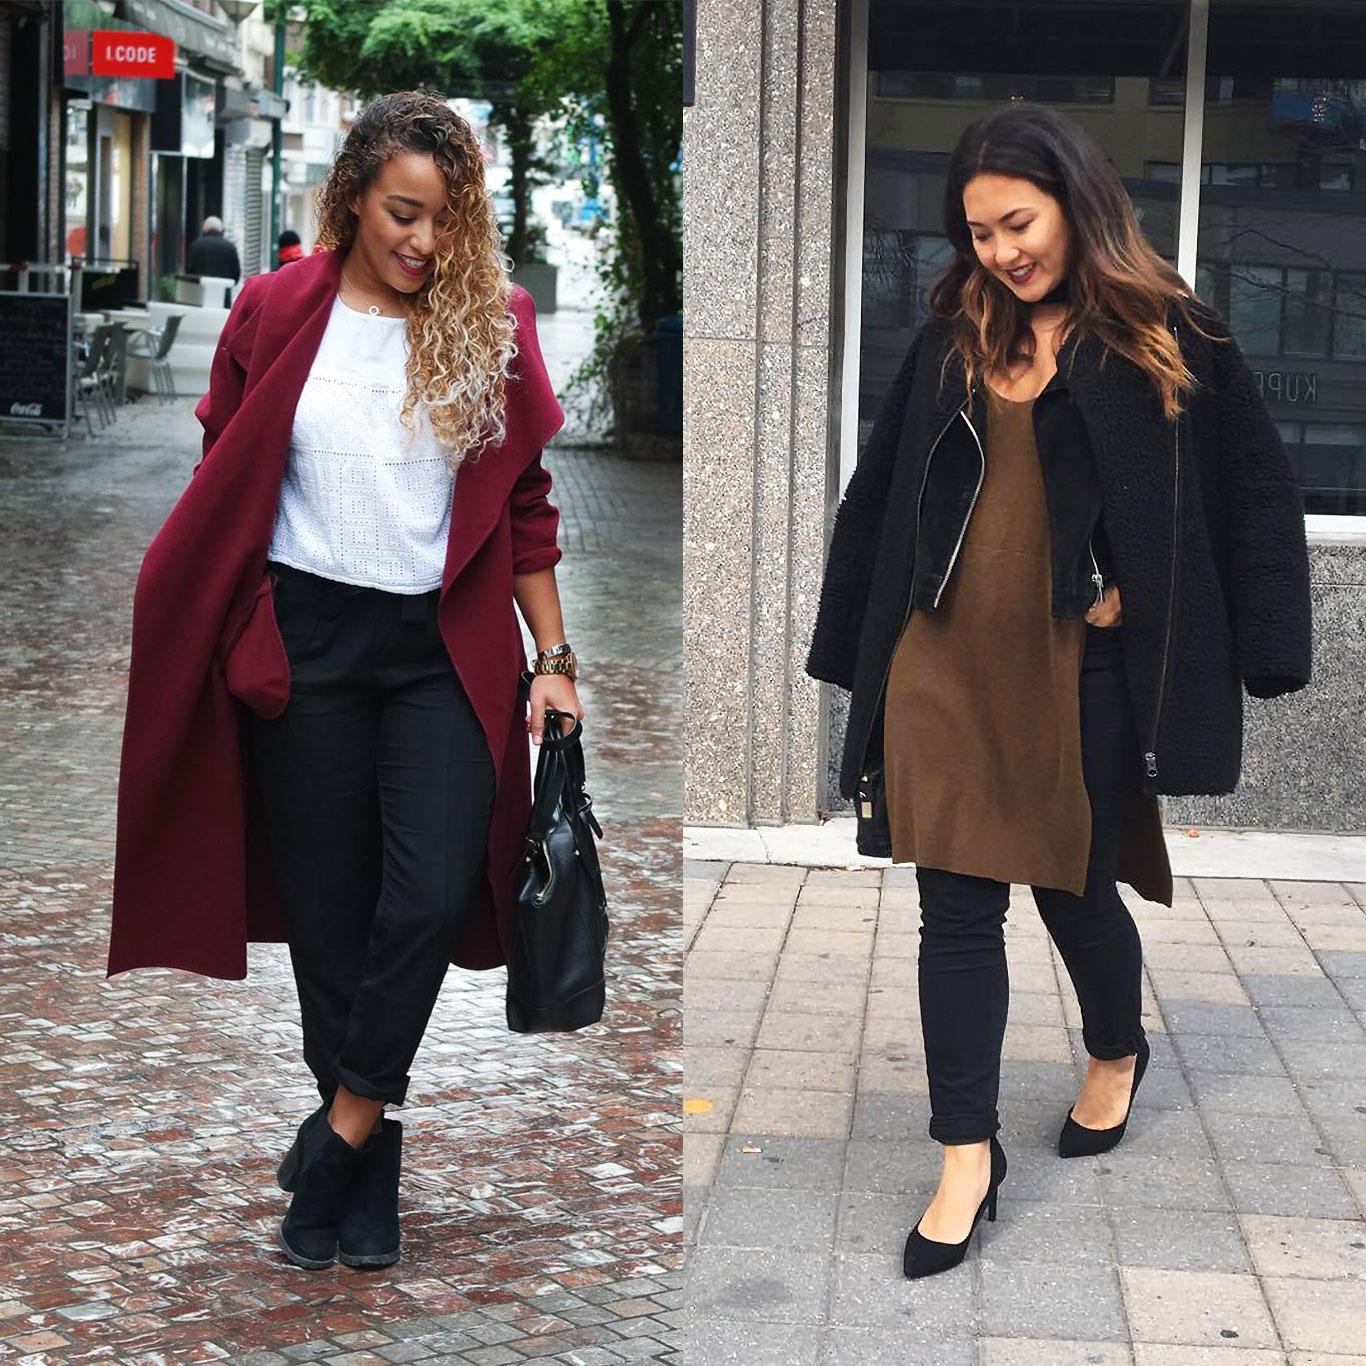 zalando-creative-content-award-belgium-canada-blog-style-mode-look-hiver-blogueuse-belge